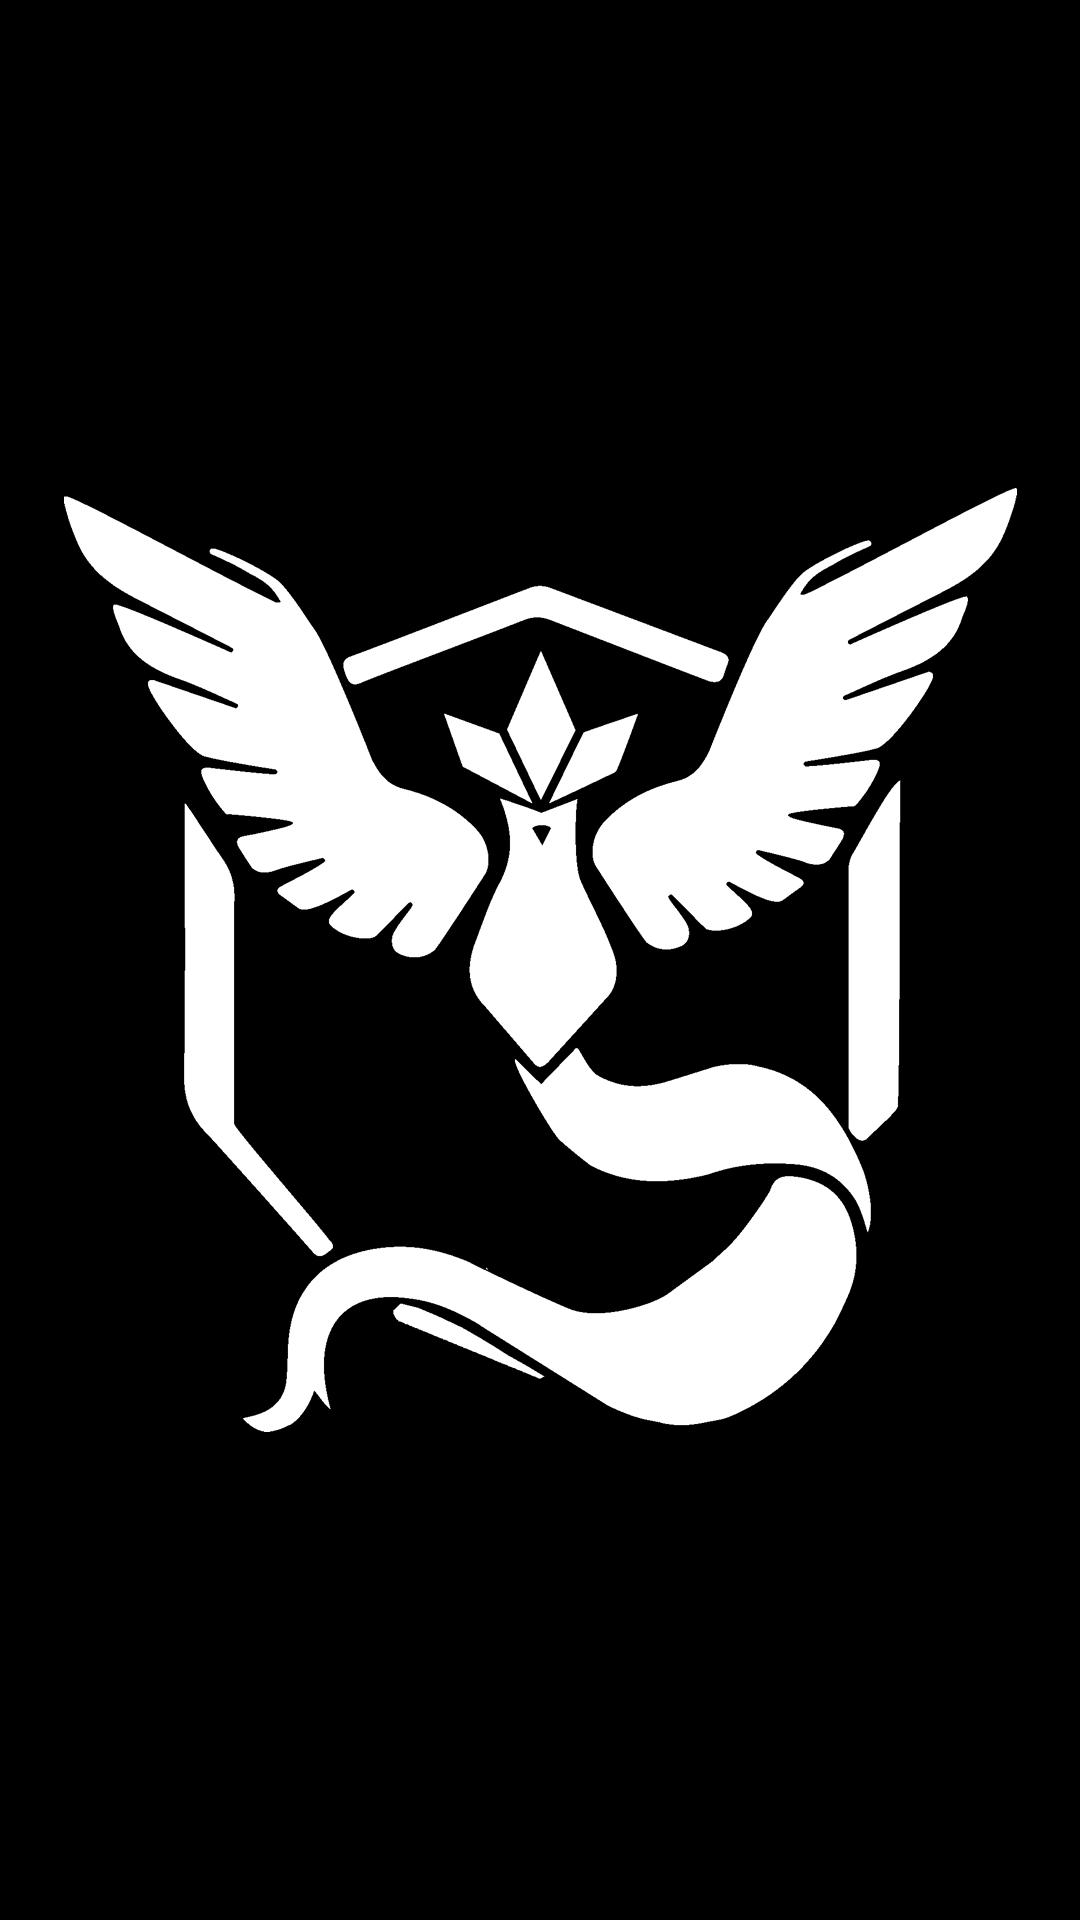 Team Mystic Black White Imgur Mitologi Nordik Mitologi